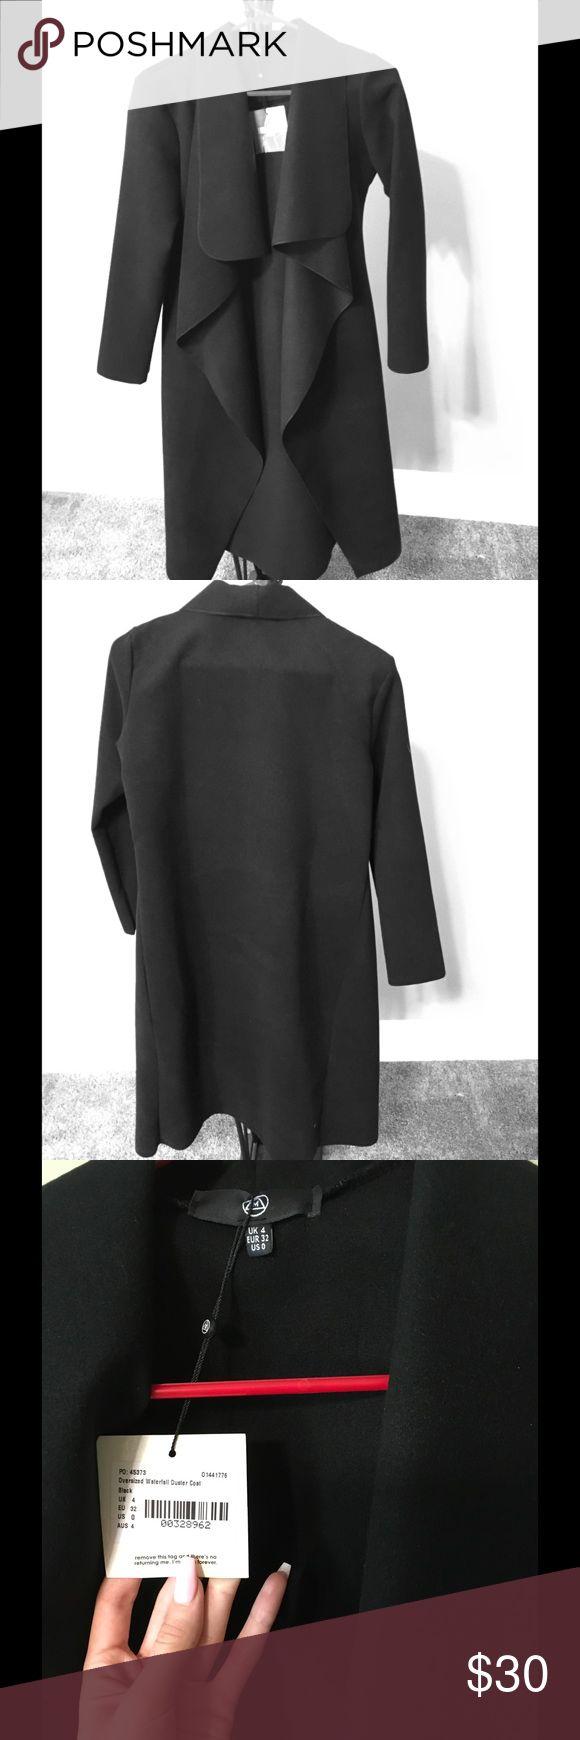 Black Waterfall Coat NWT. Long (duster length), thick material, no pockets, long sleeves. Missguided Jackets & Coats